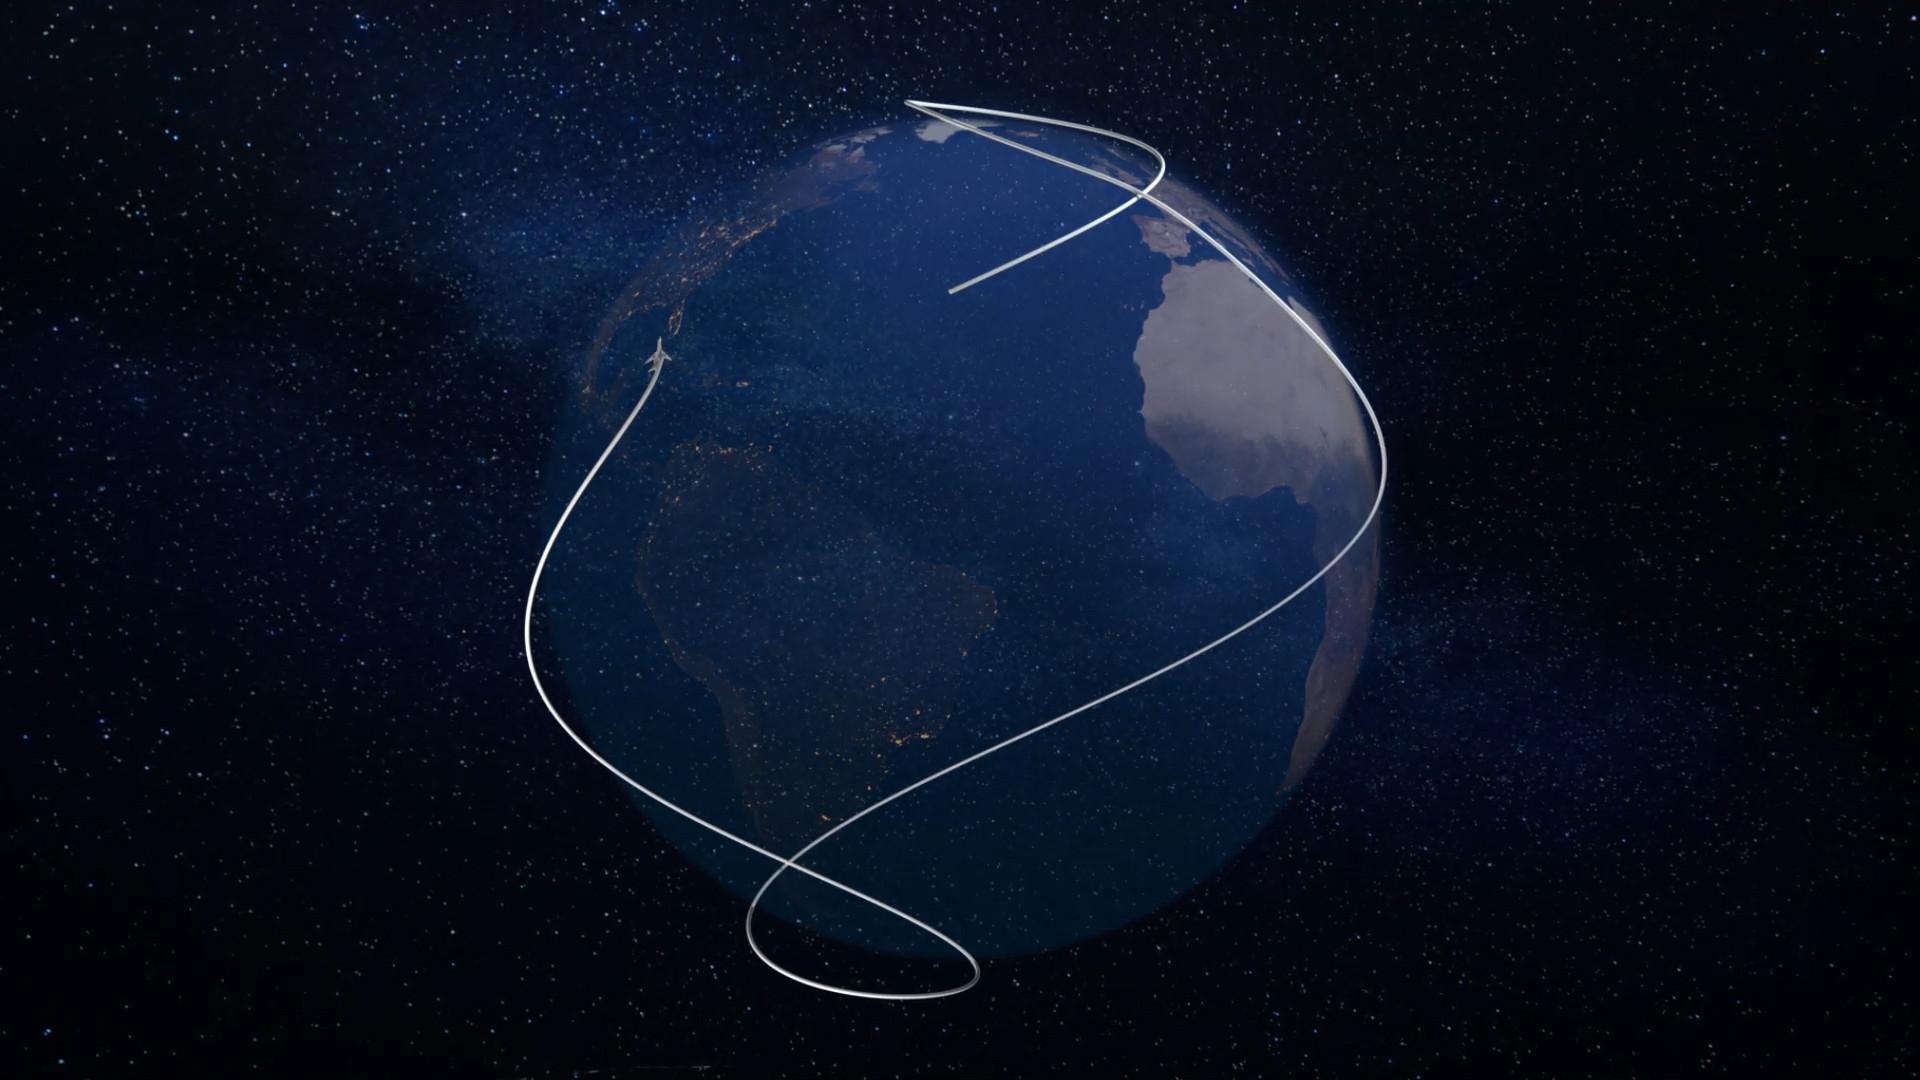 07. One More Orbit Flight Path